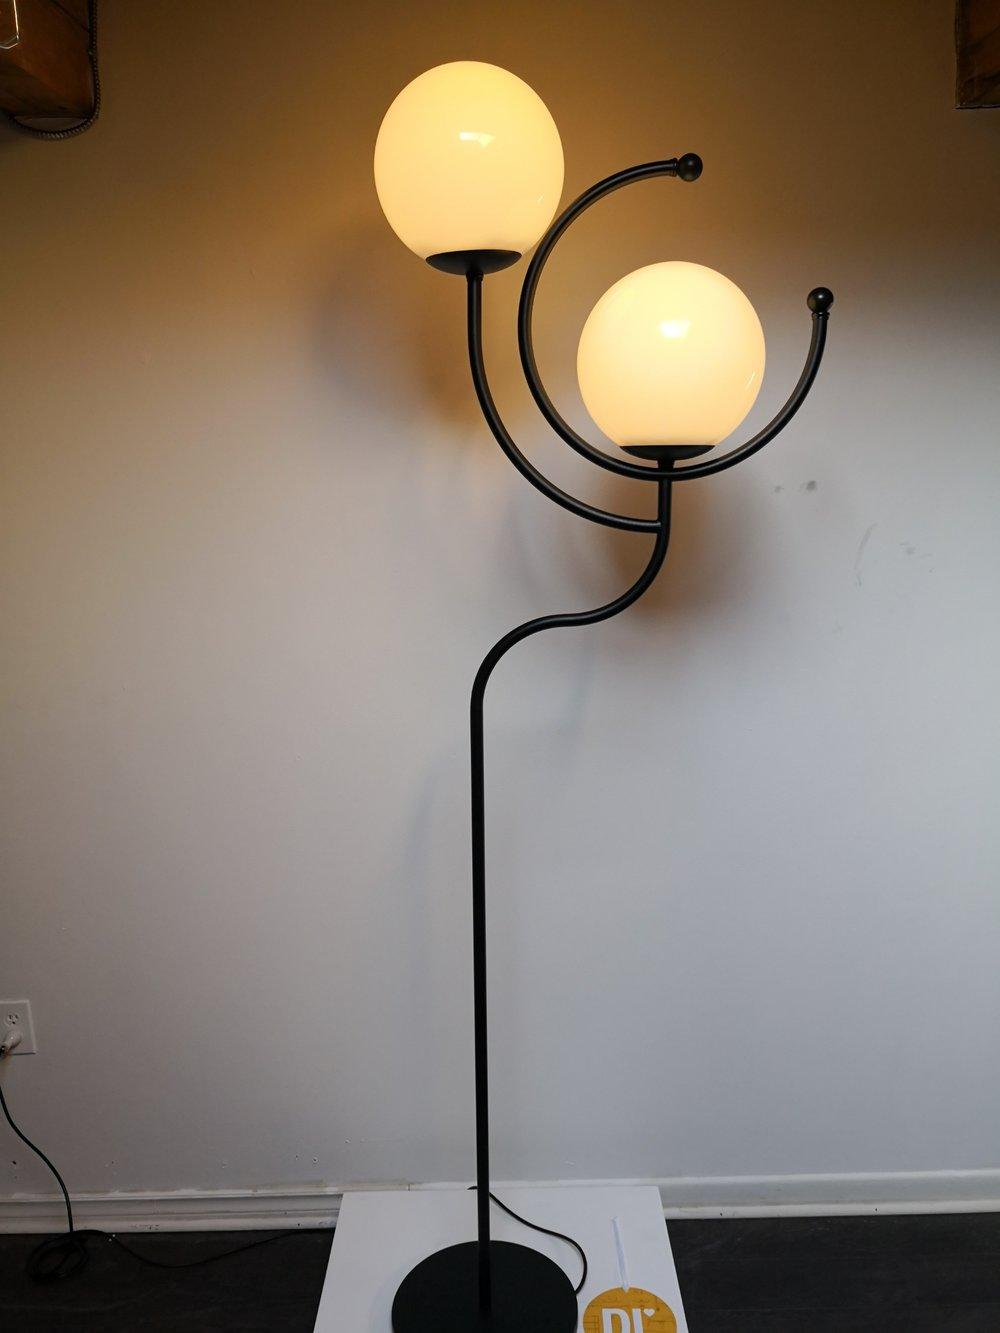 Dancers Floor Lamp by Natalie Sirianni